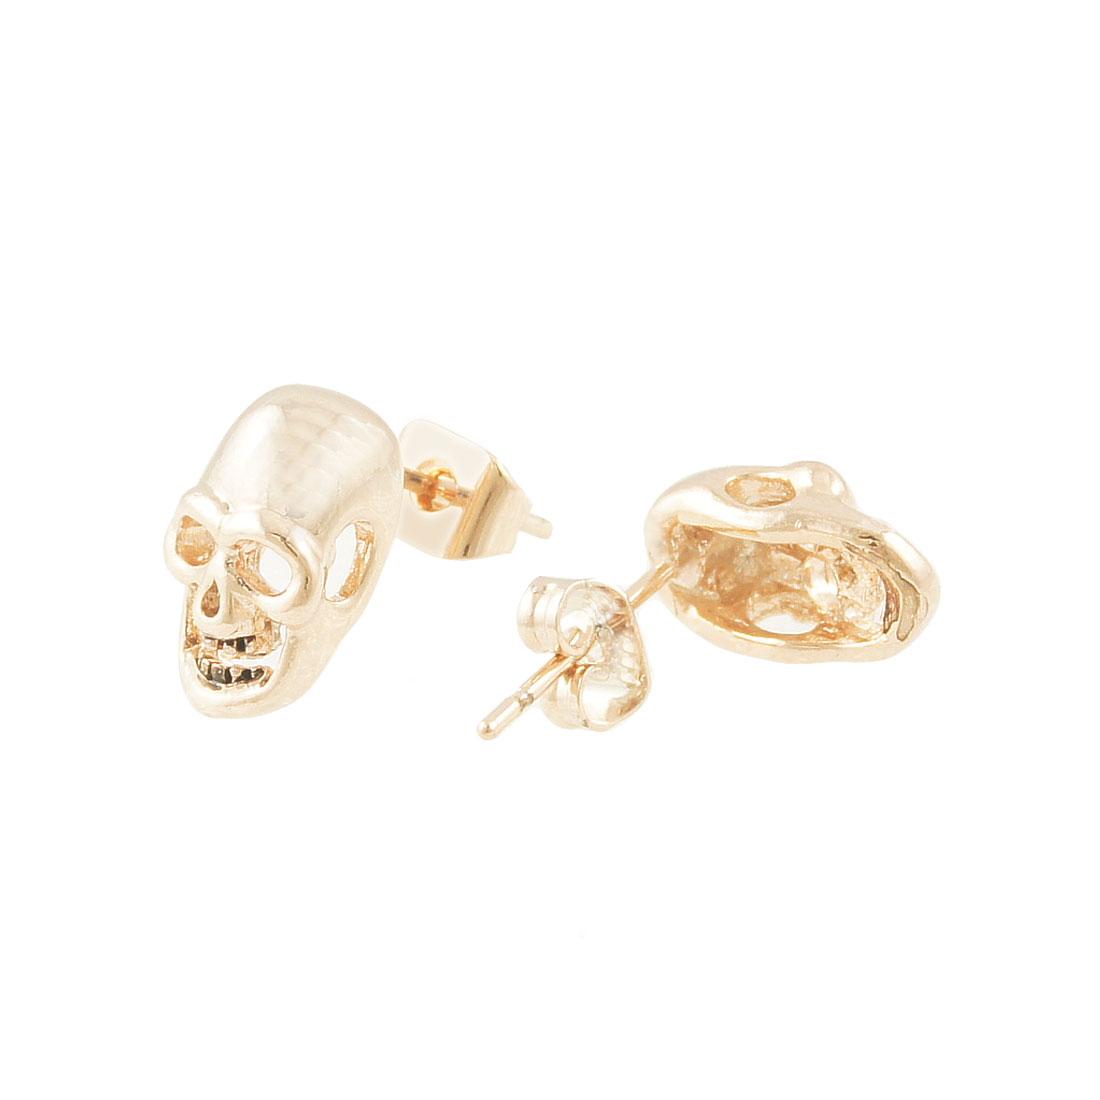 Pair Gold Tone Plastic Metal Skull Head Ear Studs Earrings